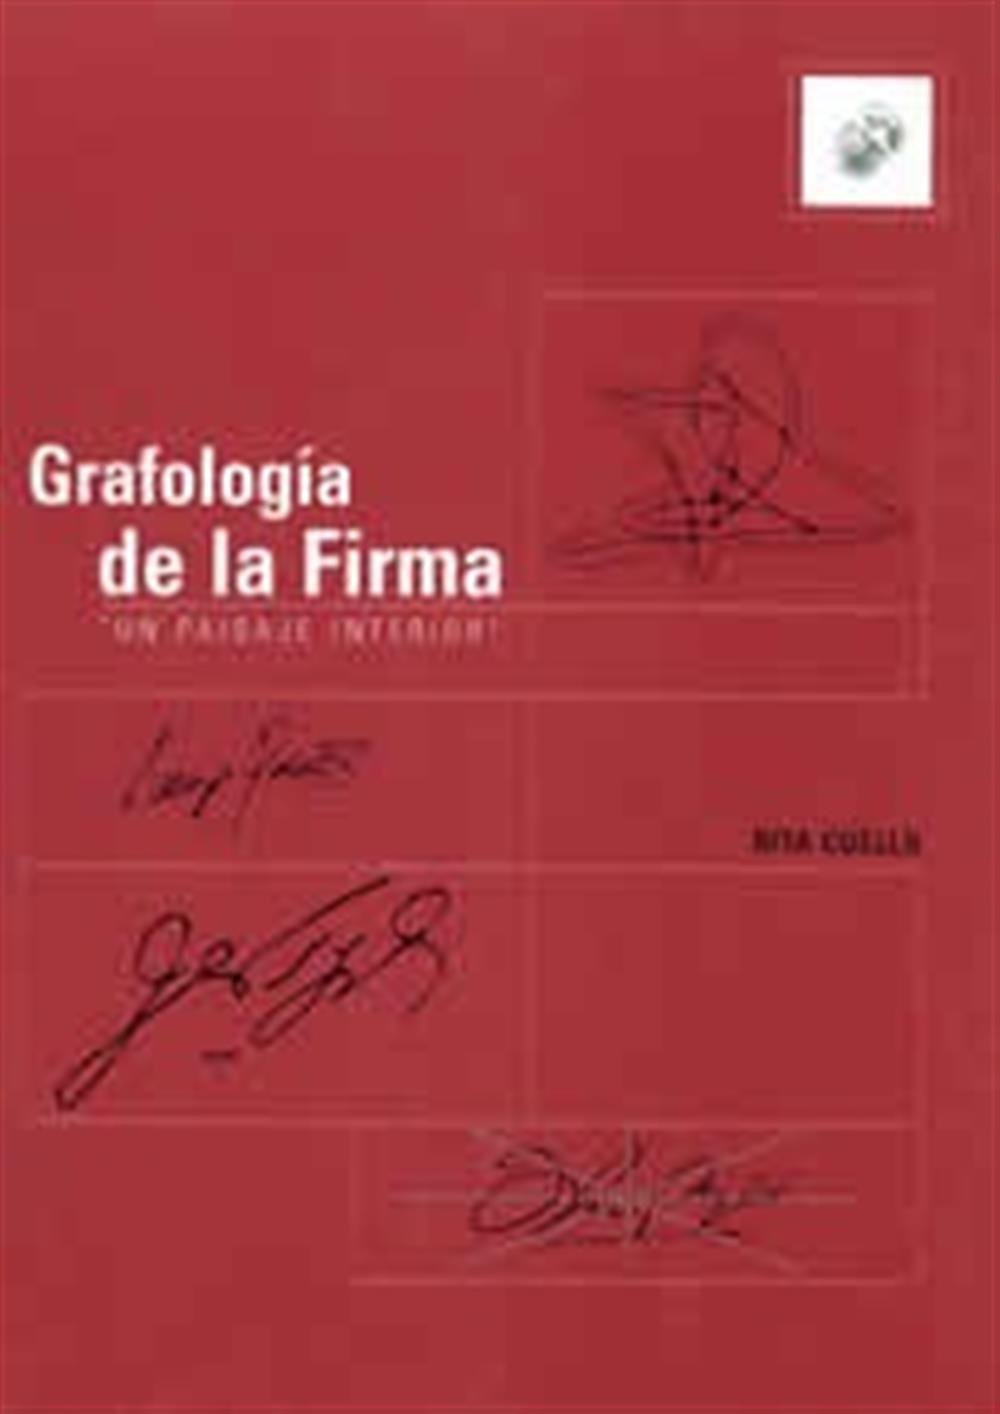 Grafología de la firma- Un paisaje interior